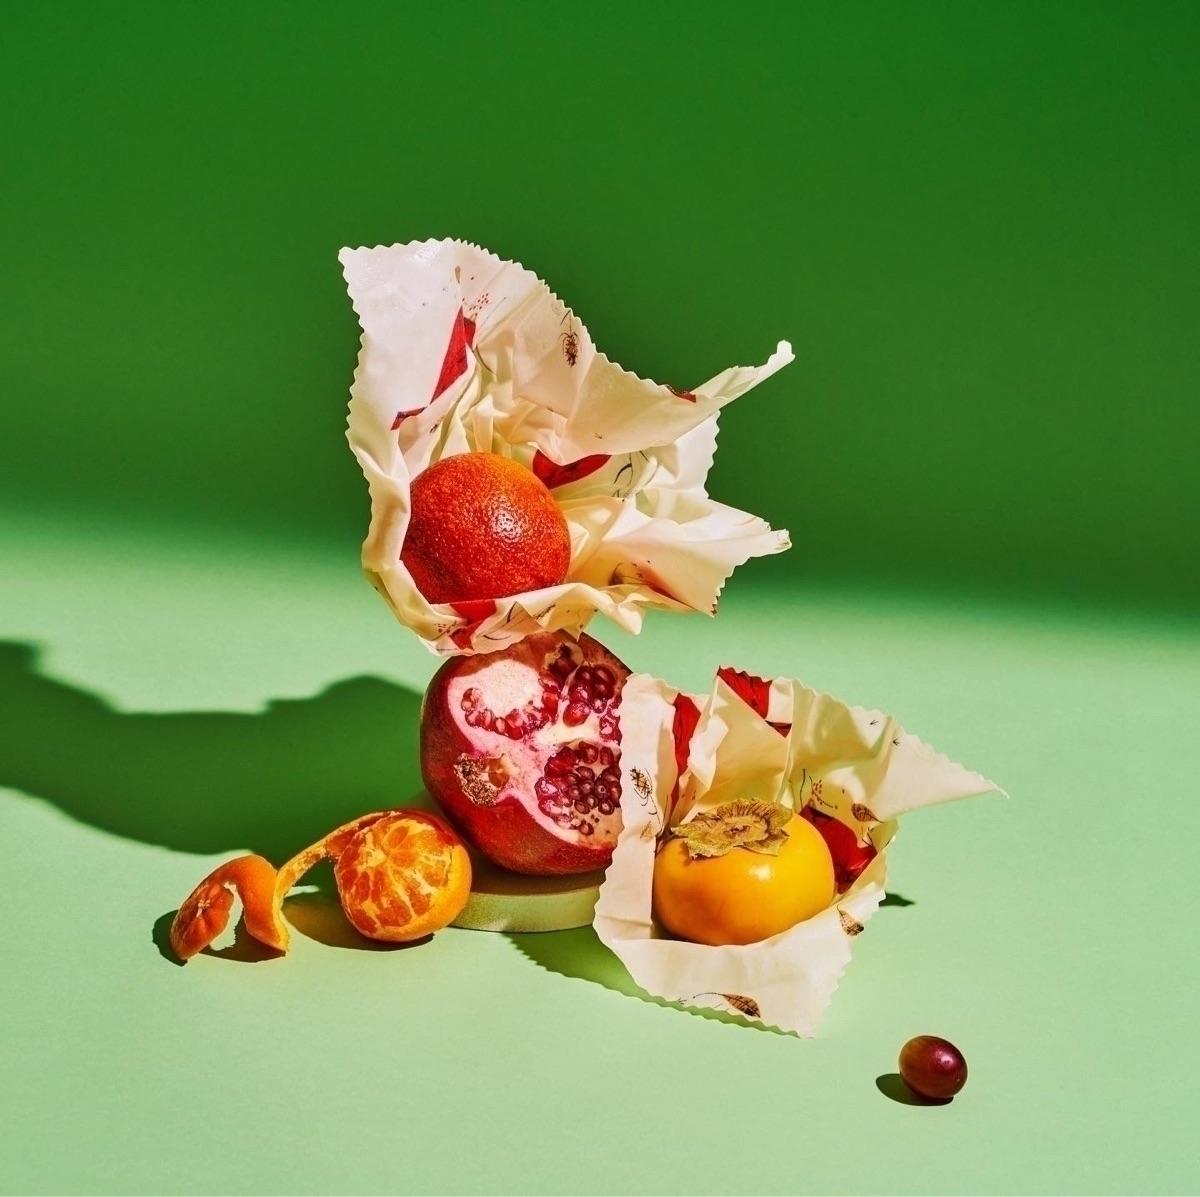 waxed paper life - photography, ellohype - gabrielcabrera | ello